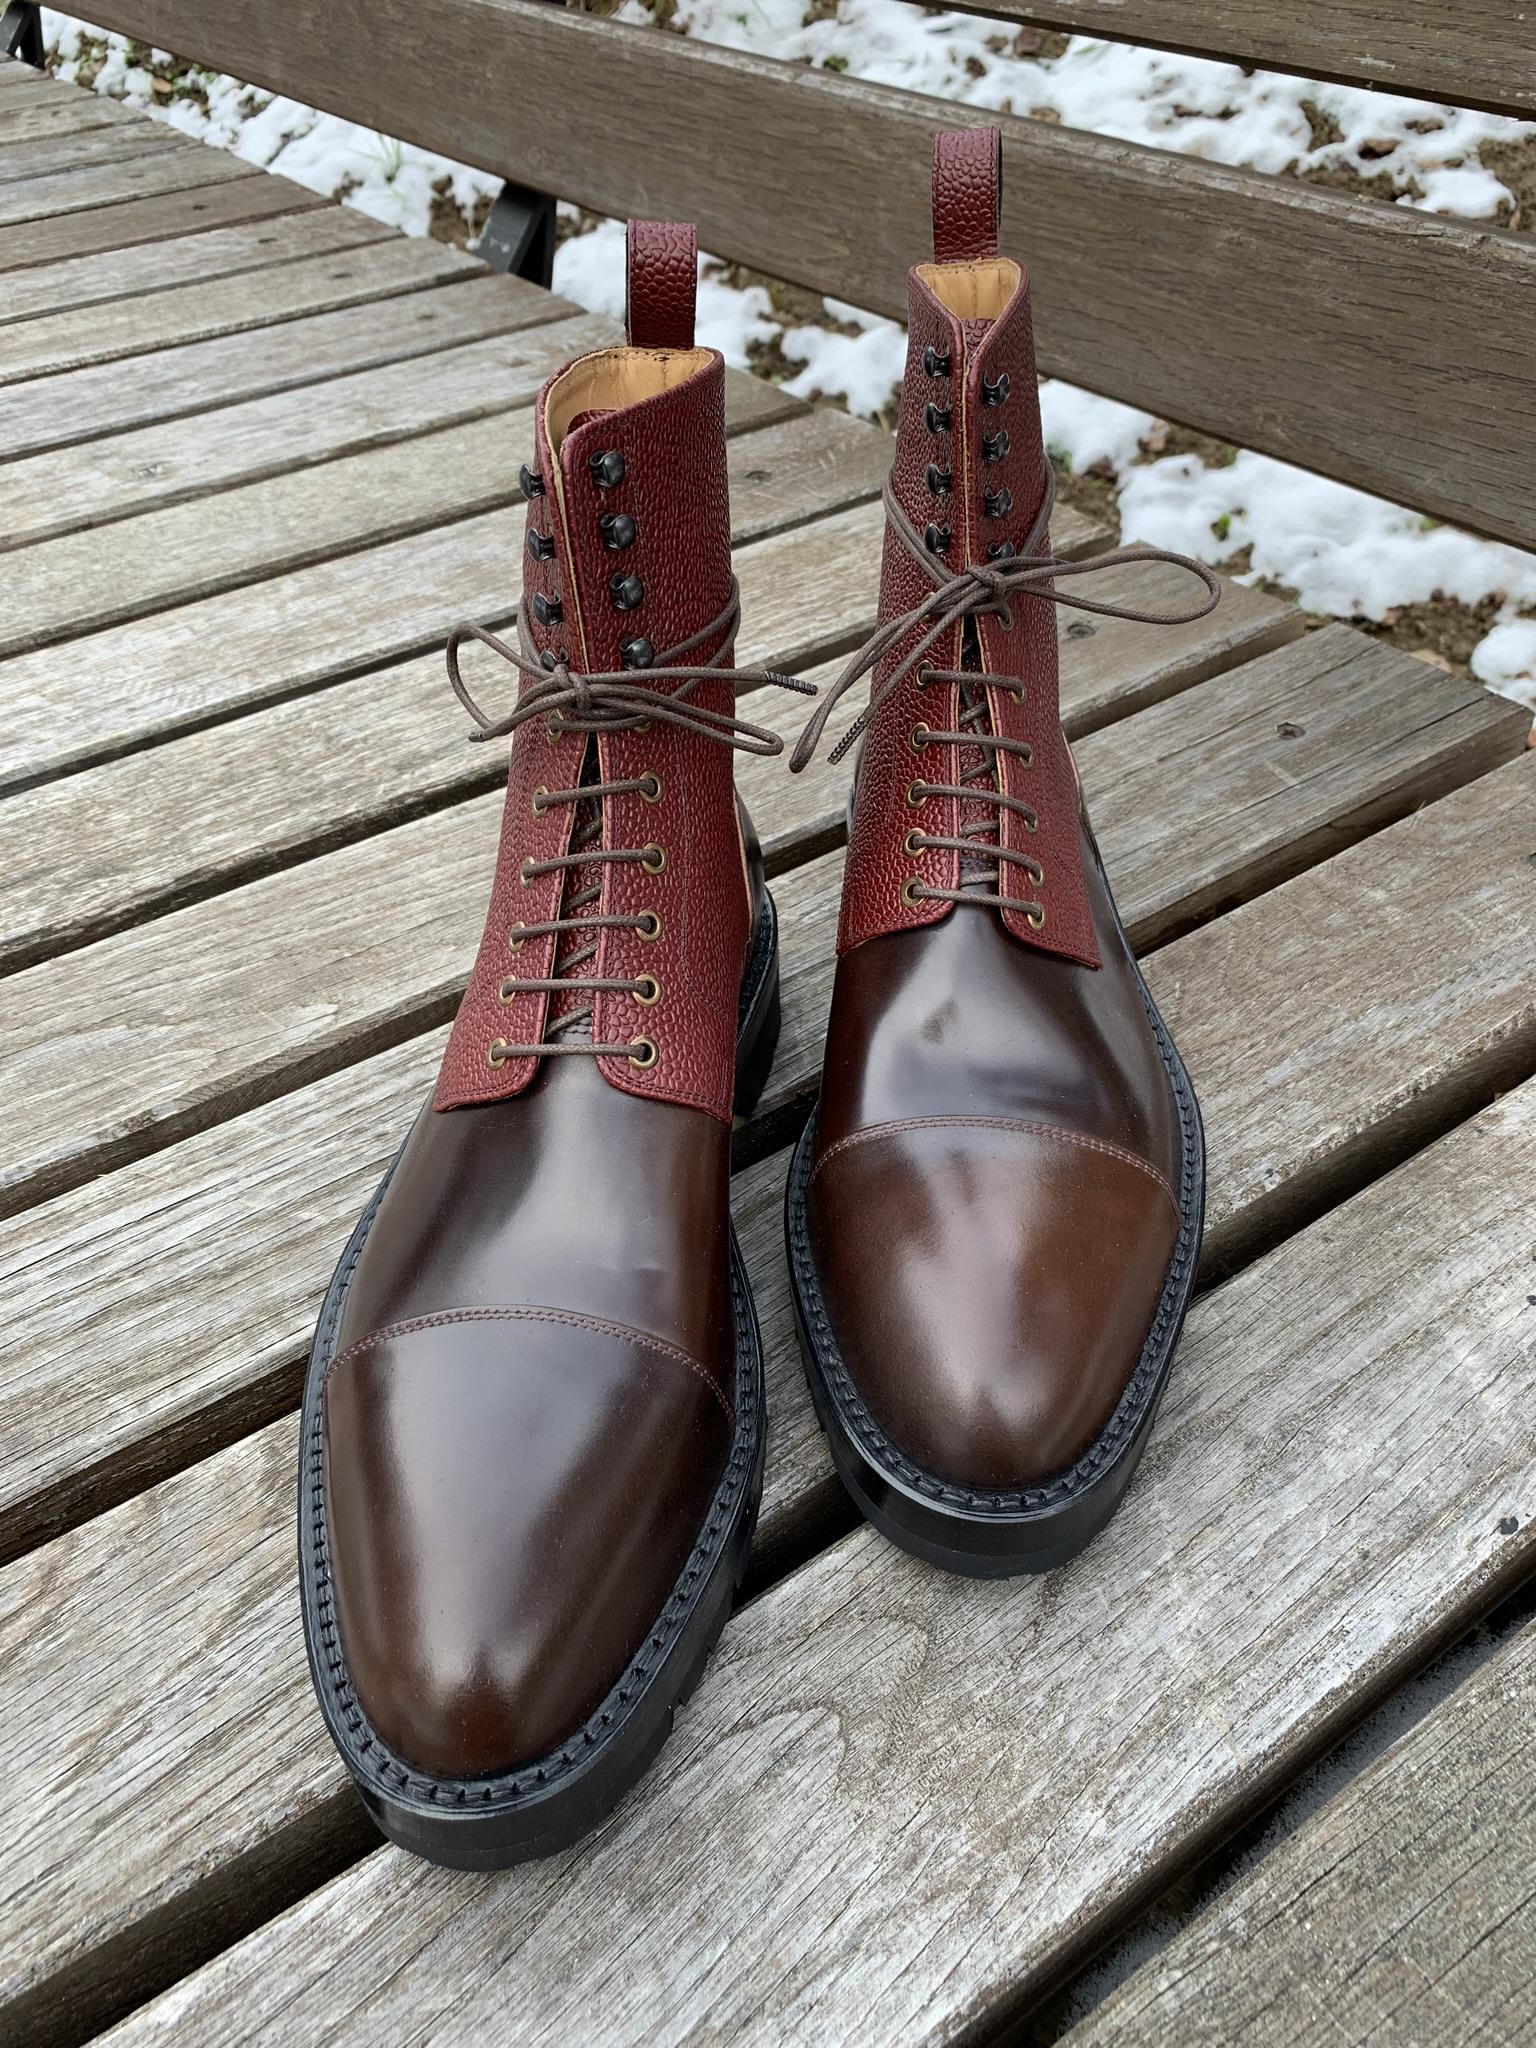 Leather-Boots-London-Shell-Scotch-Gal8